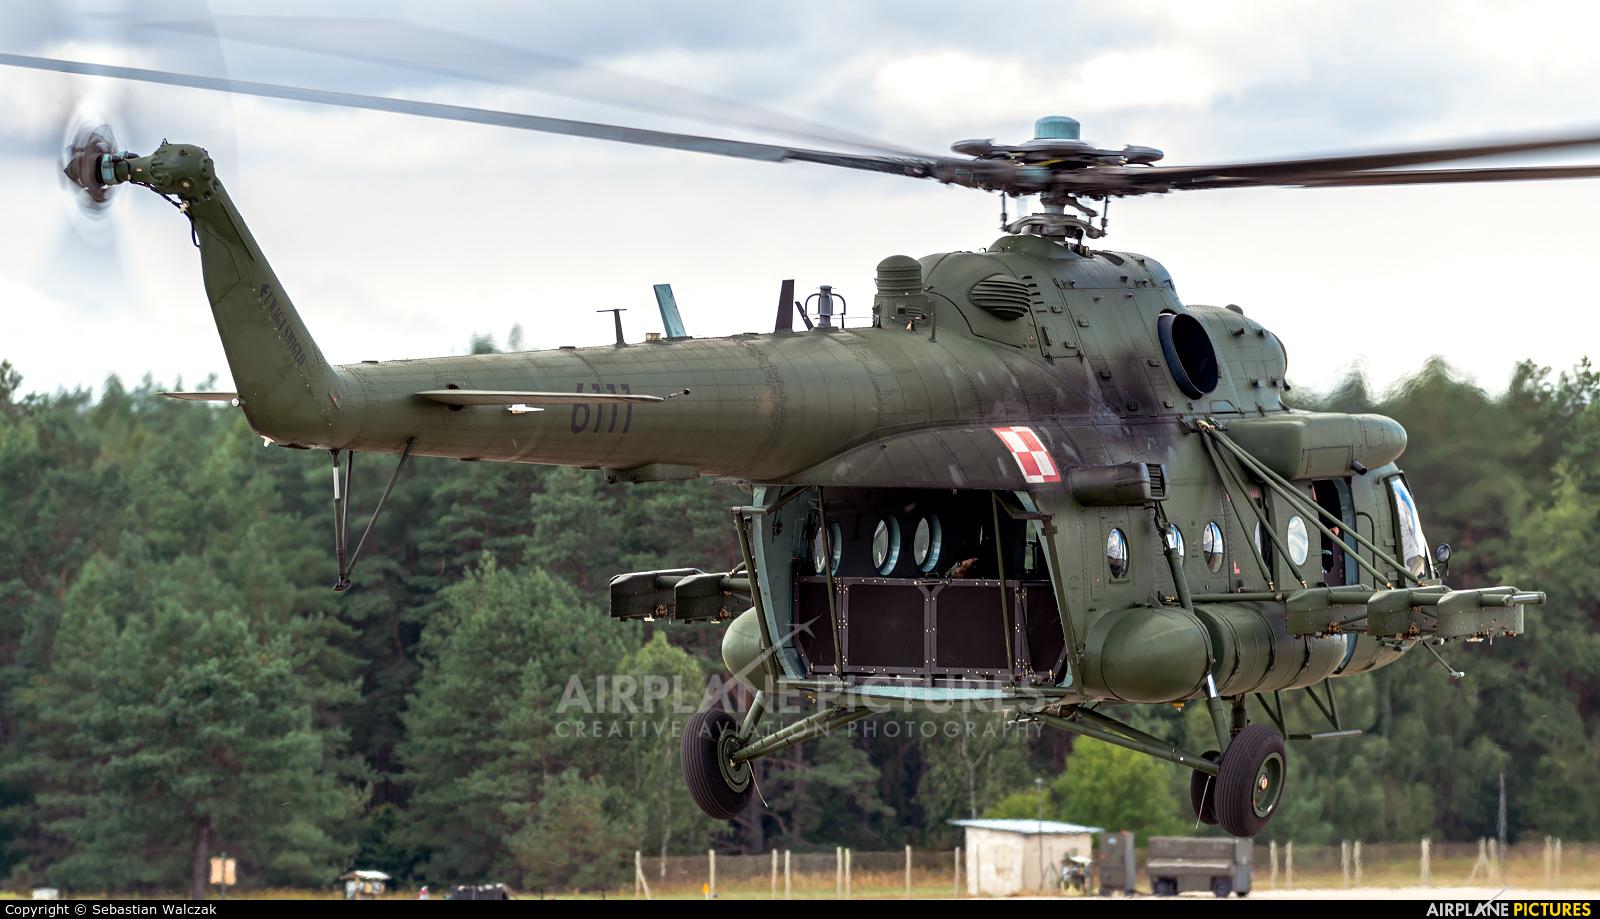 Poland - Army 6111 aircraft at Mirosławiec